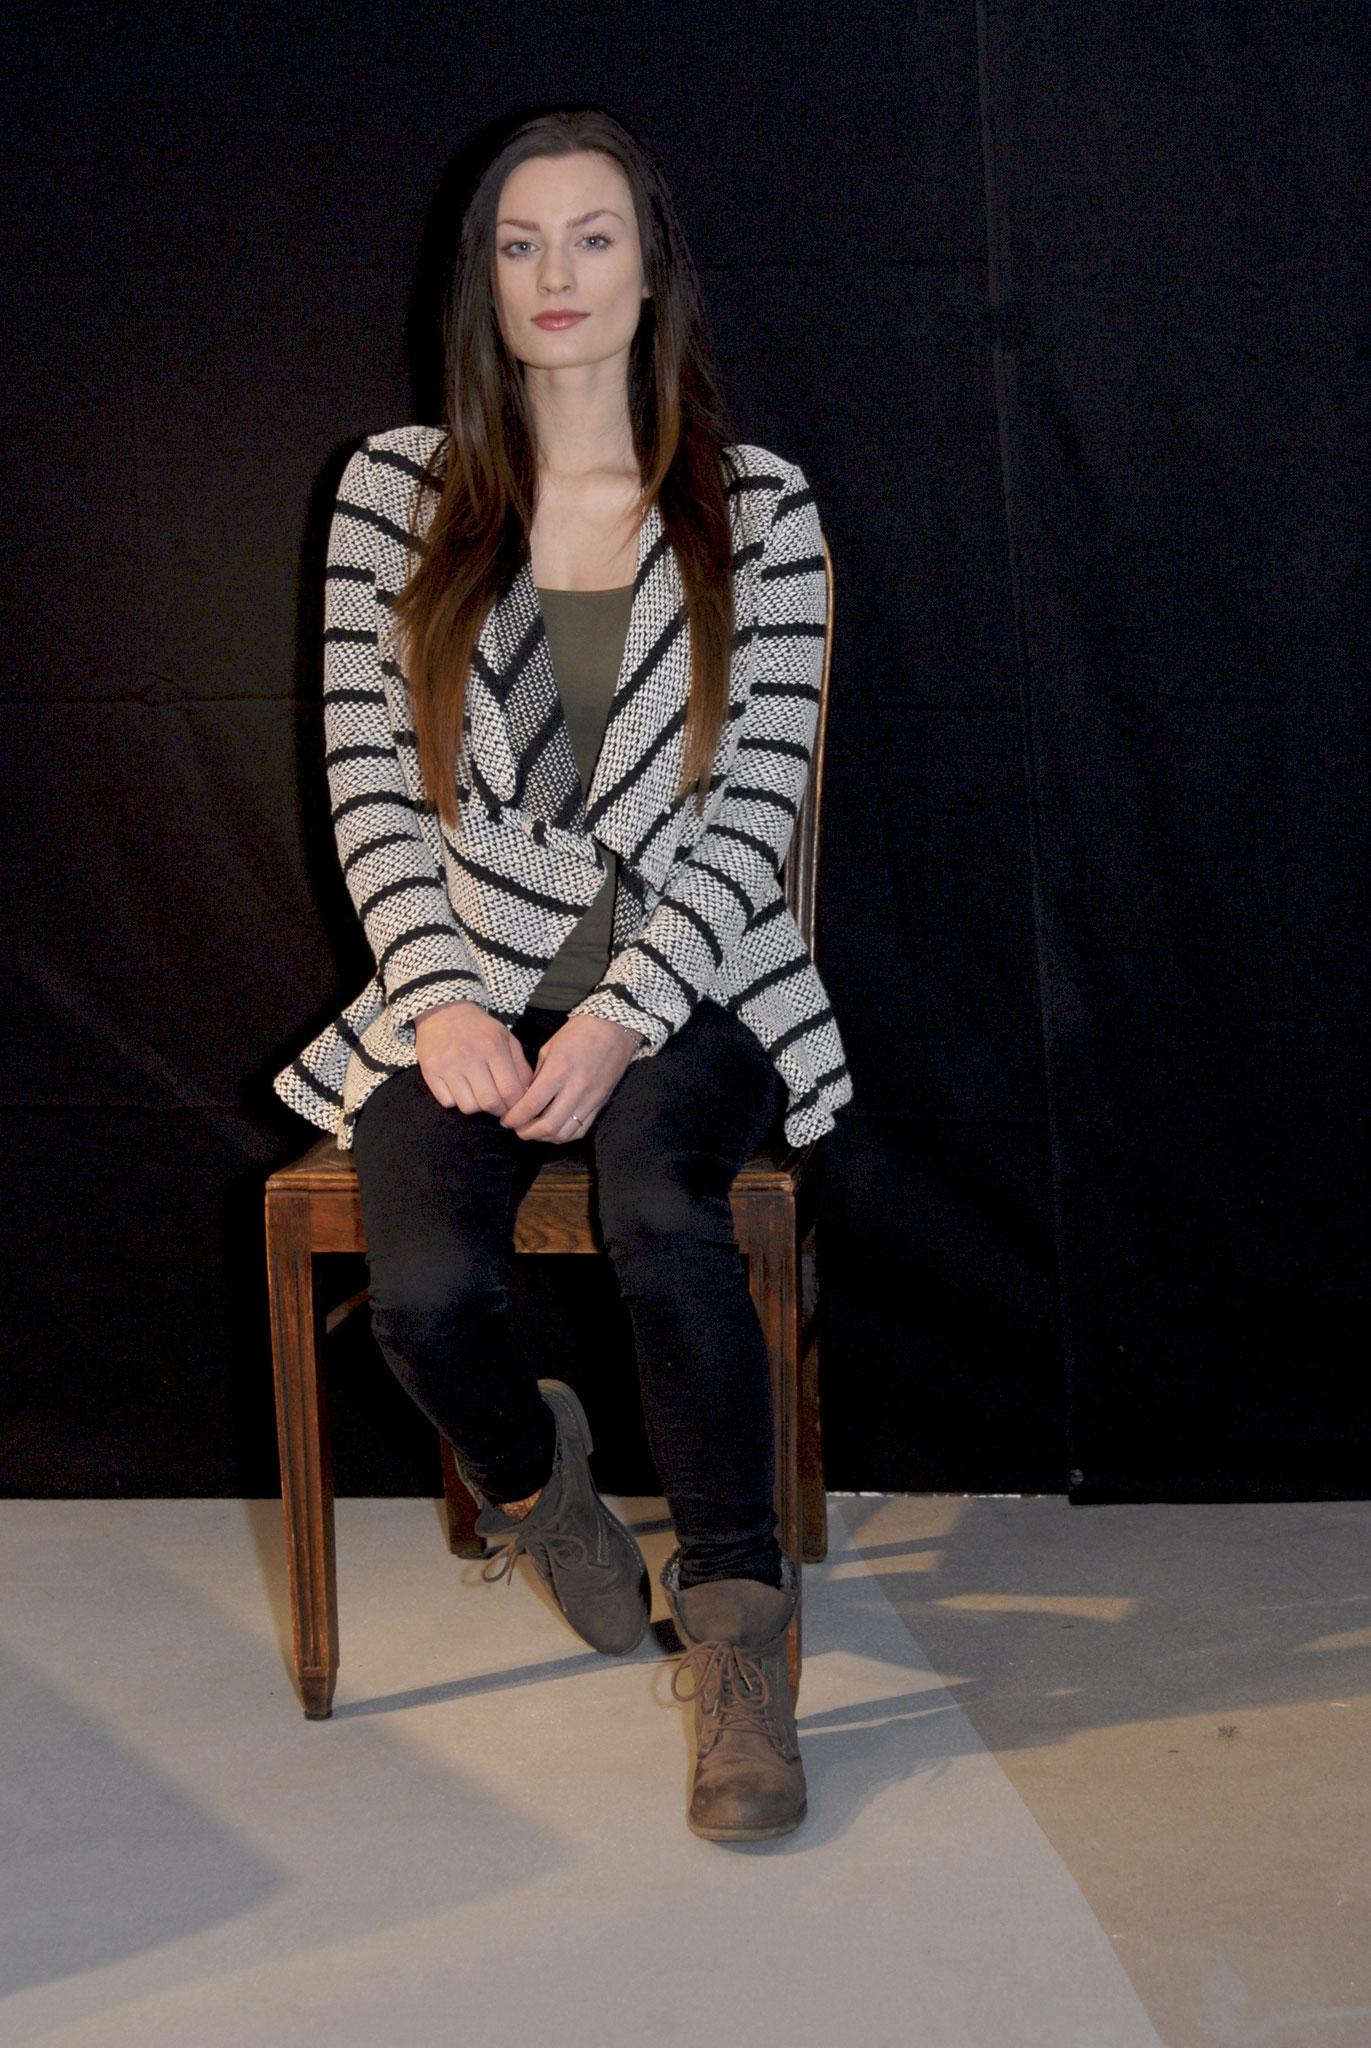 Lena Lauterjung